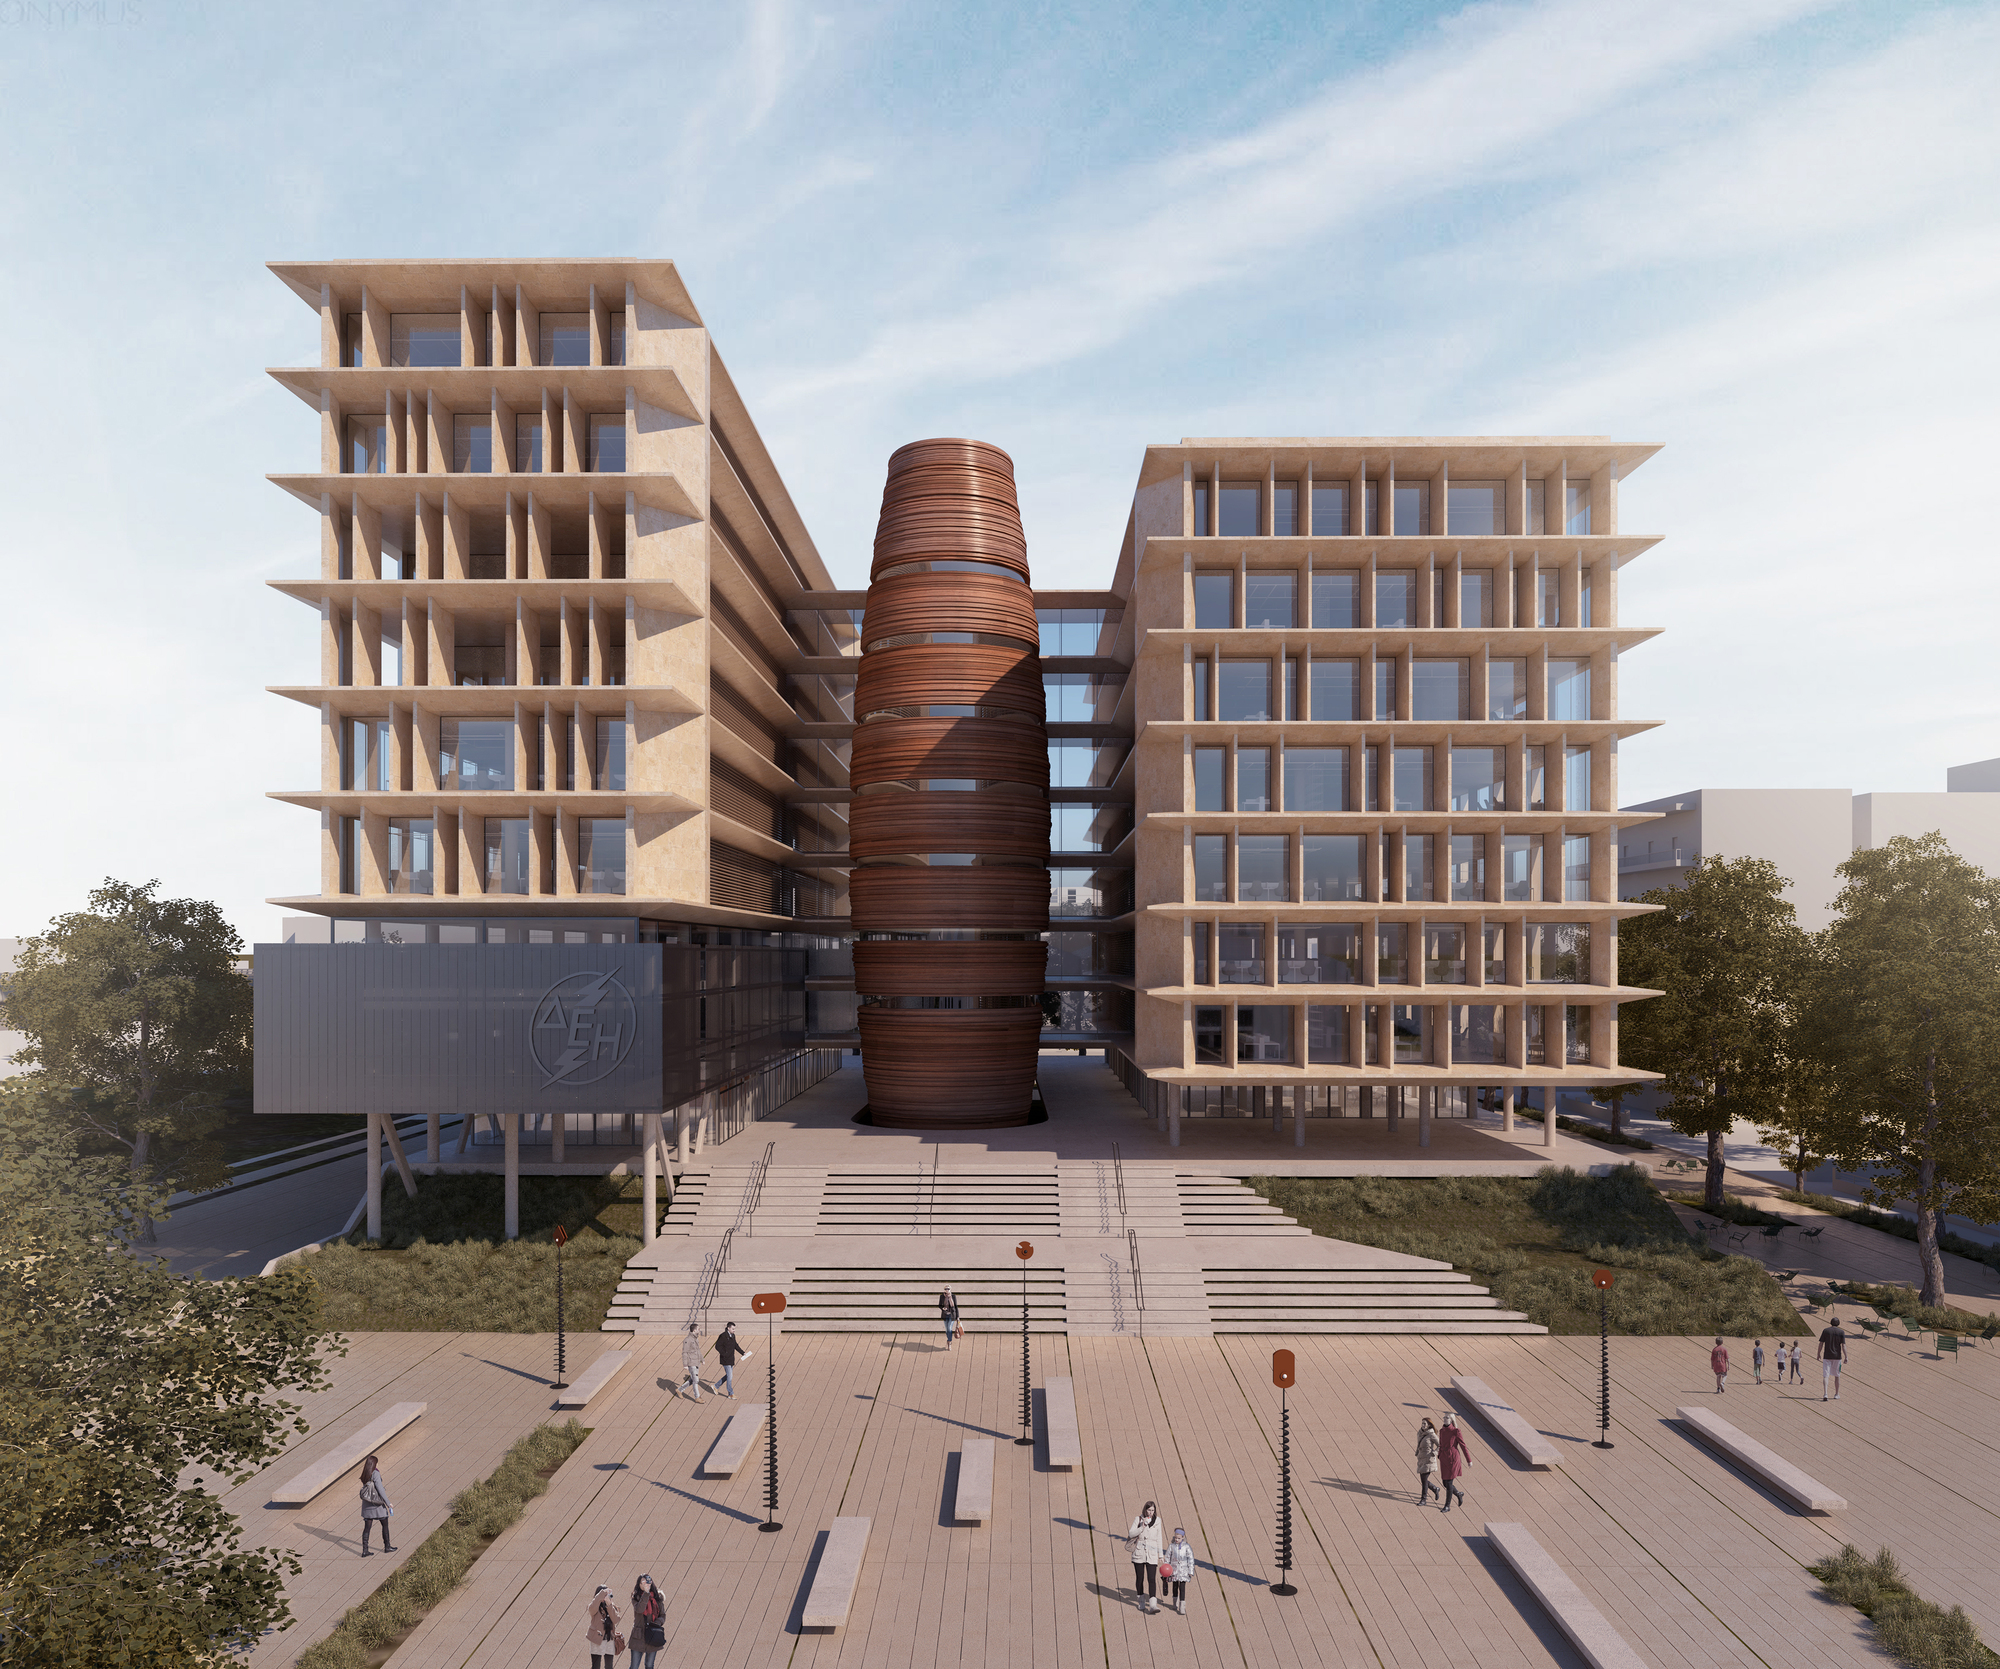 Winning Design Seeks to Increase Public Power Corporation Headquarter's Environmental Awareness